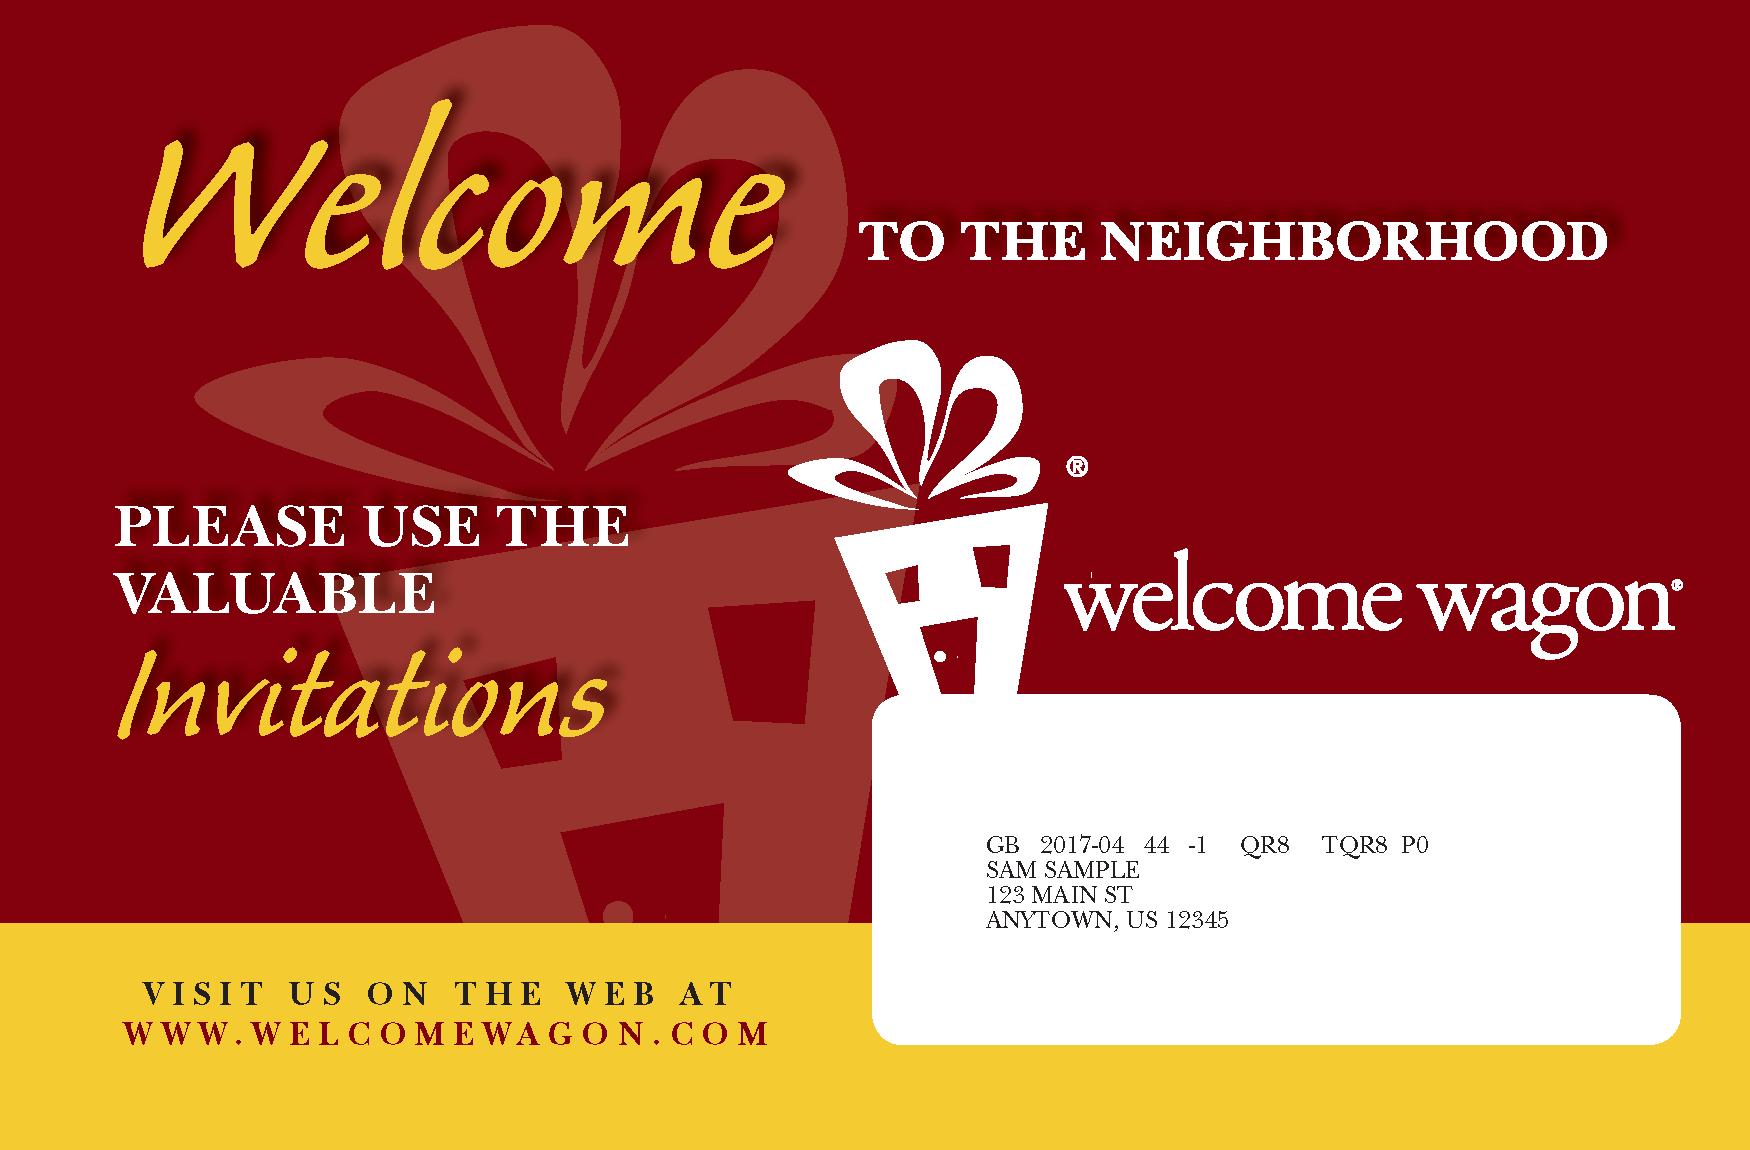 Welcome Wagon Mail Piece